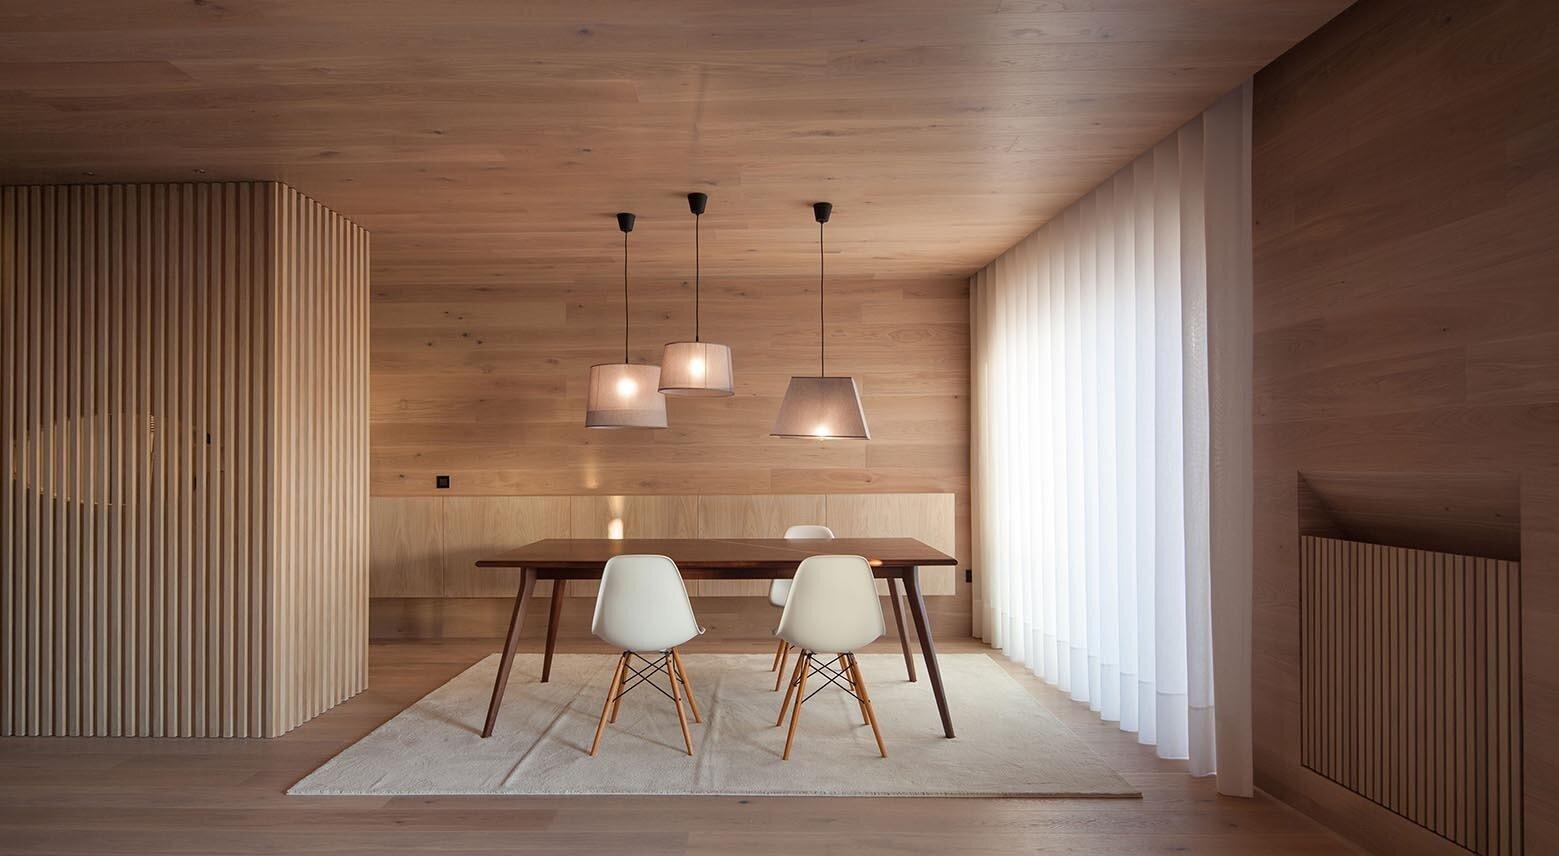 Apartment at Póvoa do Varzim - Pitagoras Group - Portugal - Dining Room - Humble Homes